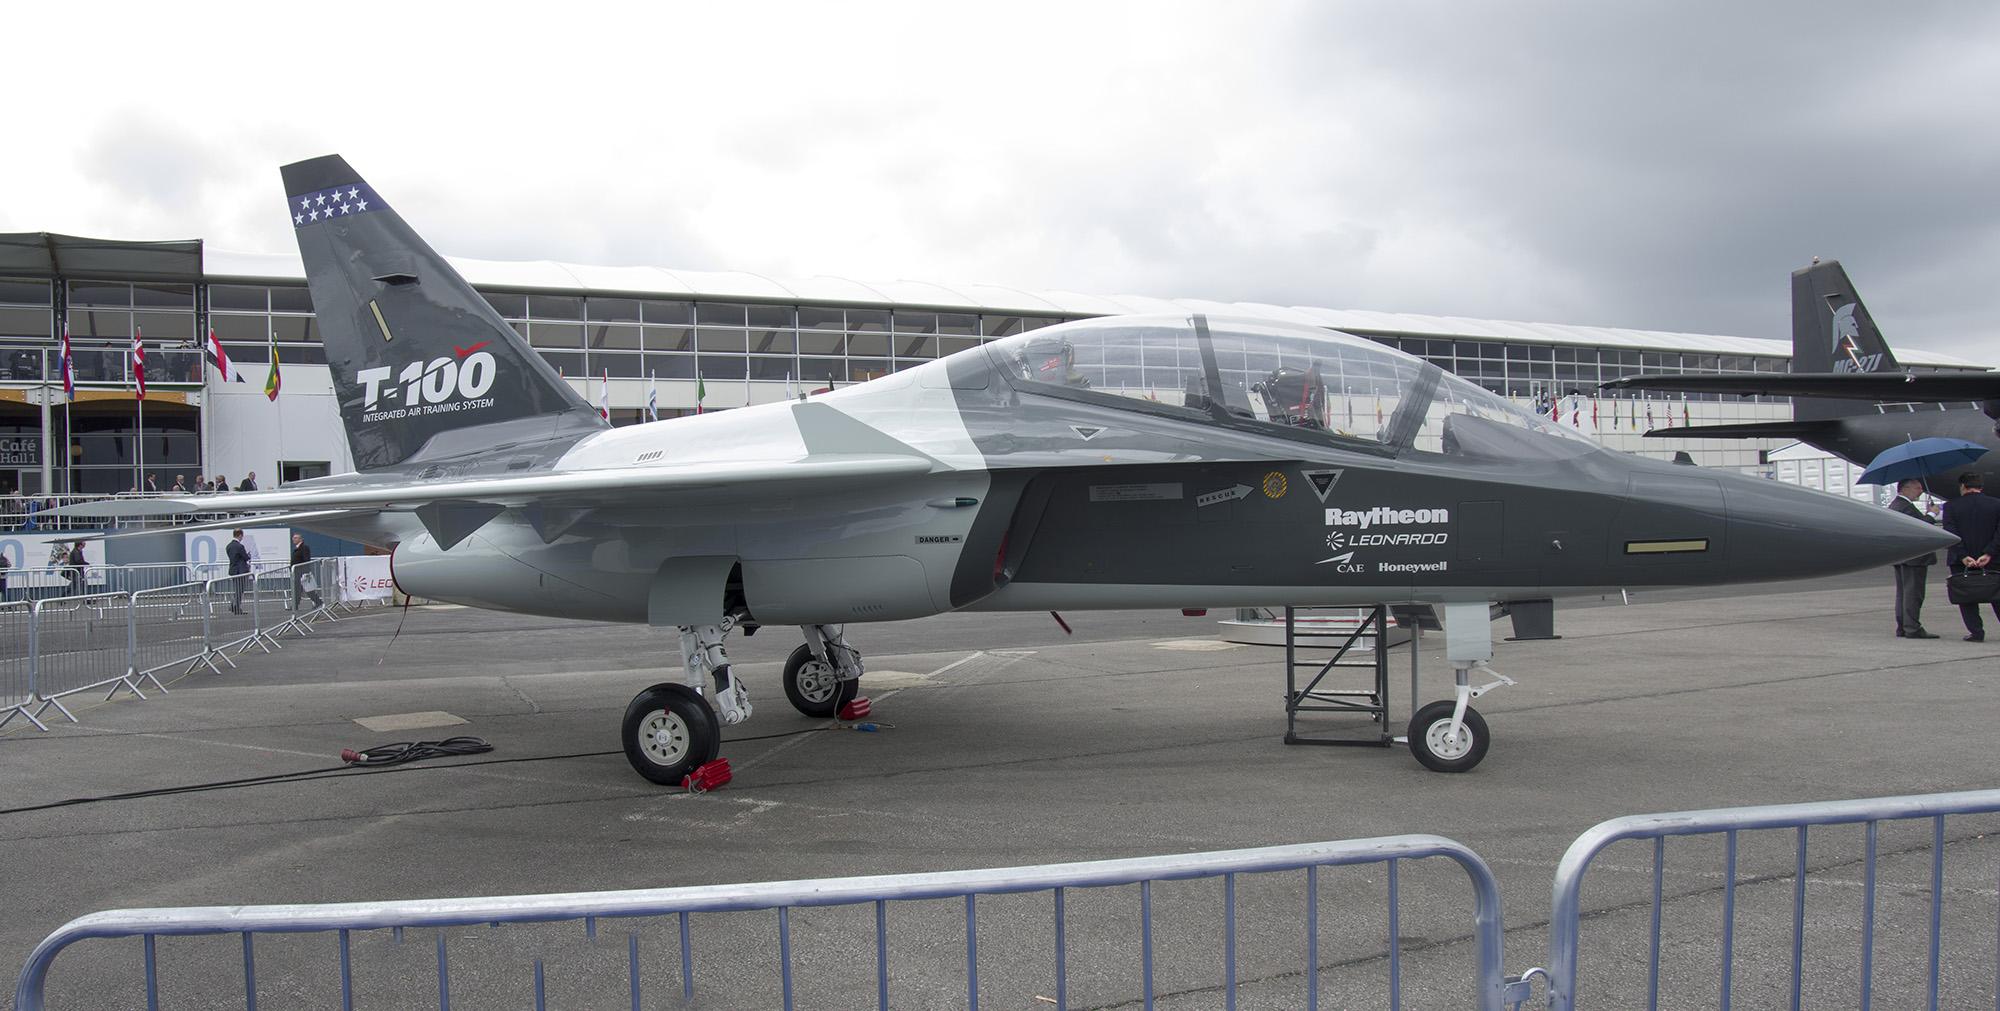 _IMG5549-5550 Raytheon T-100 Mockup s